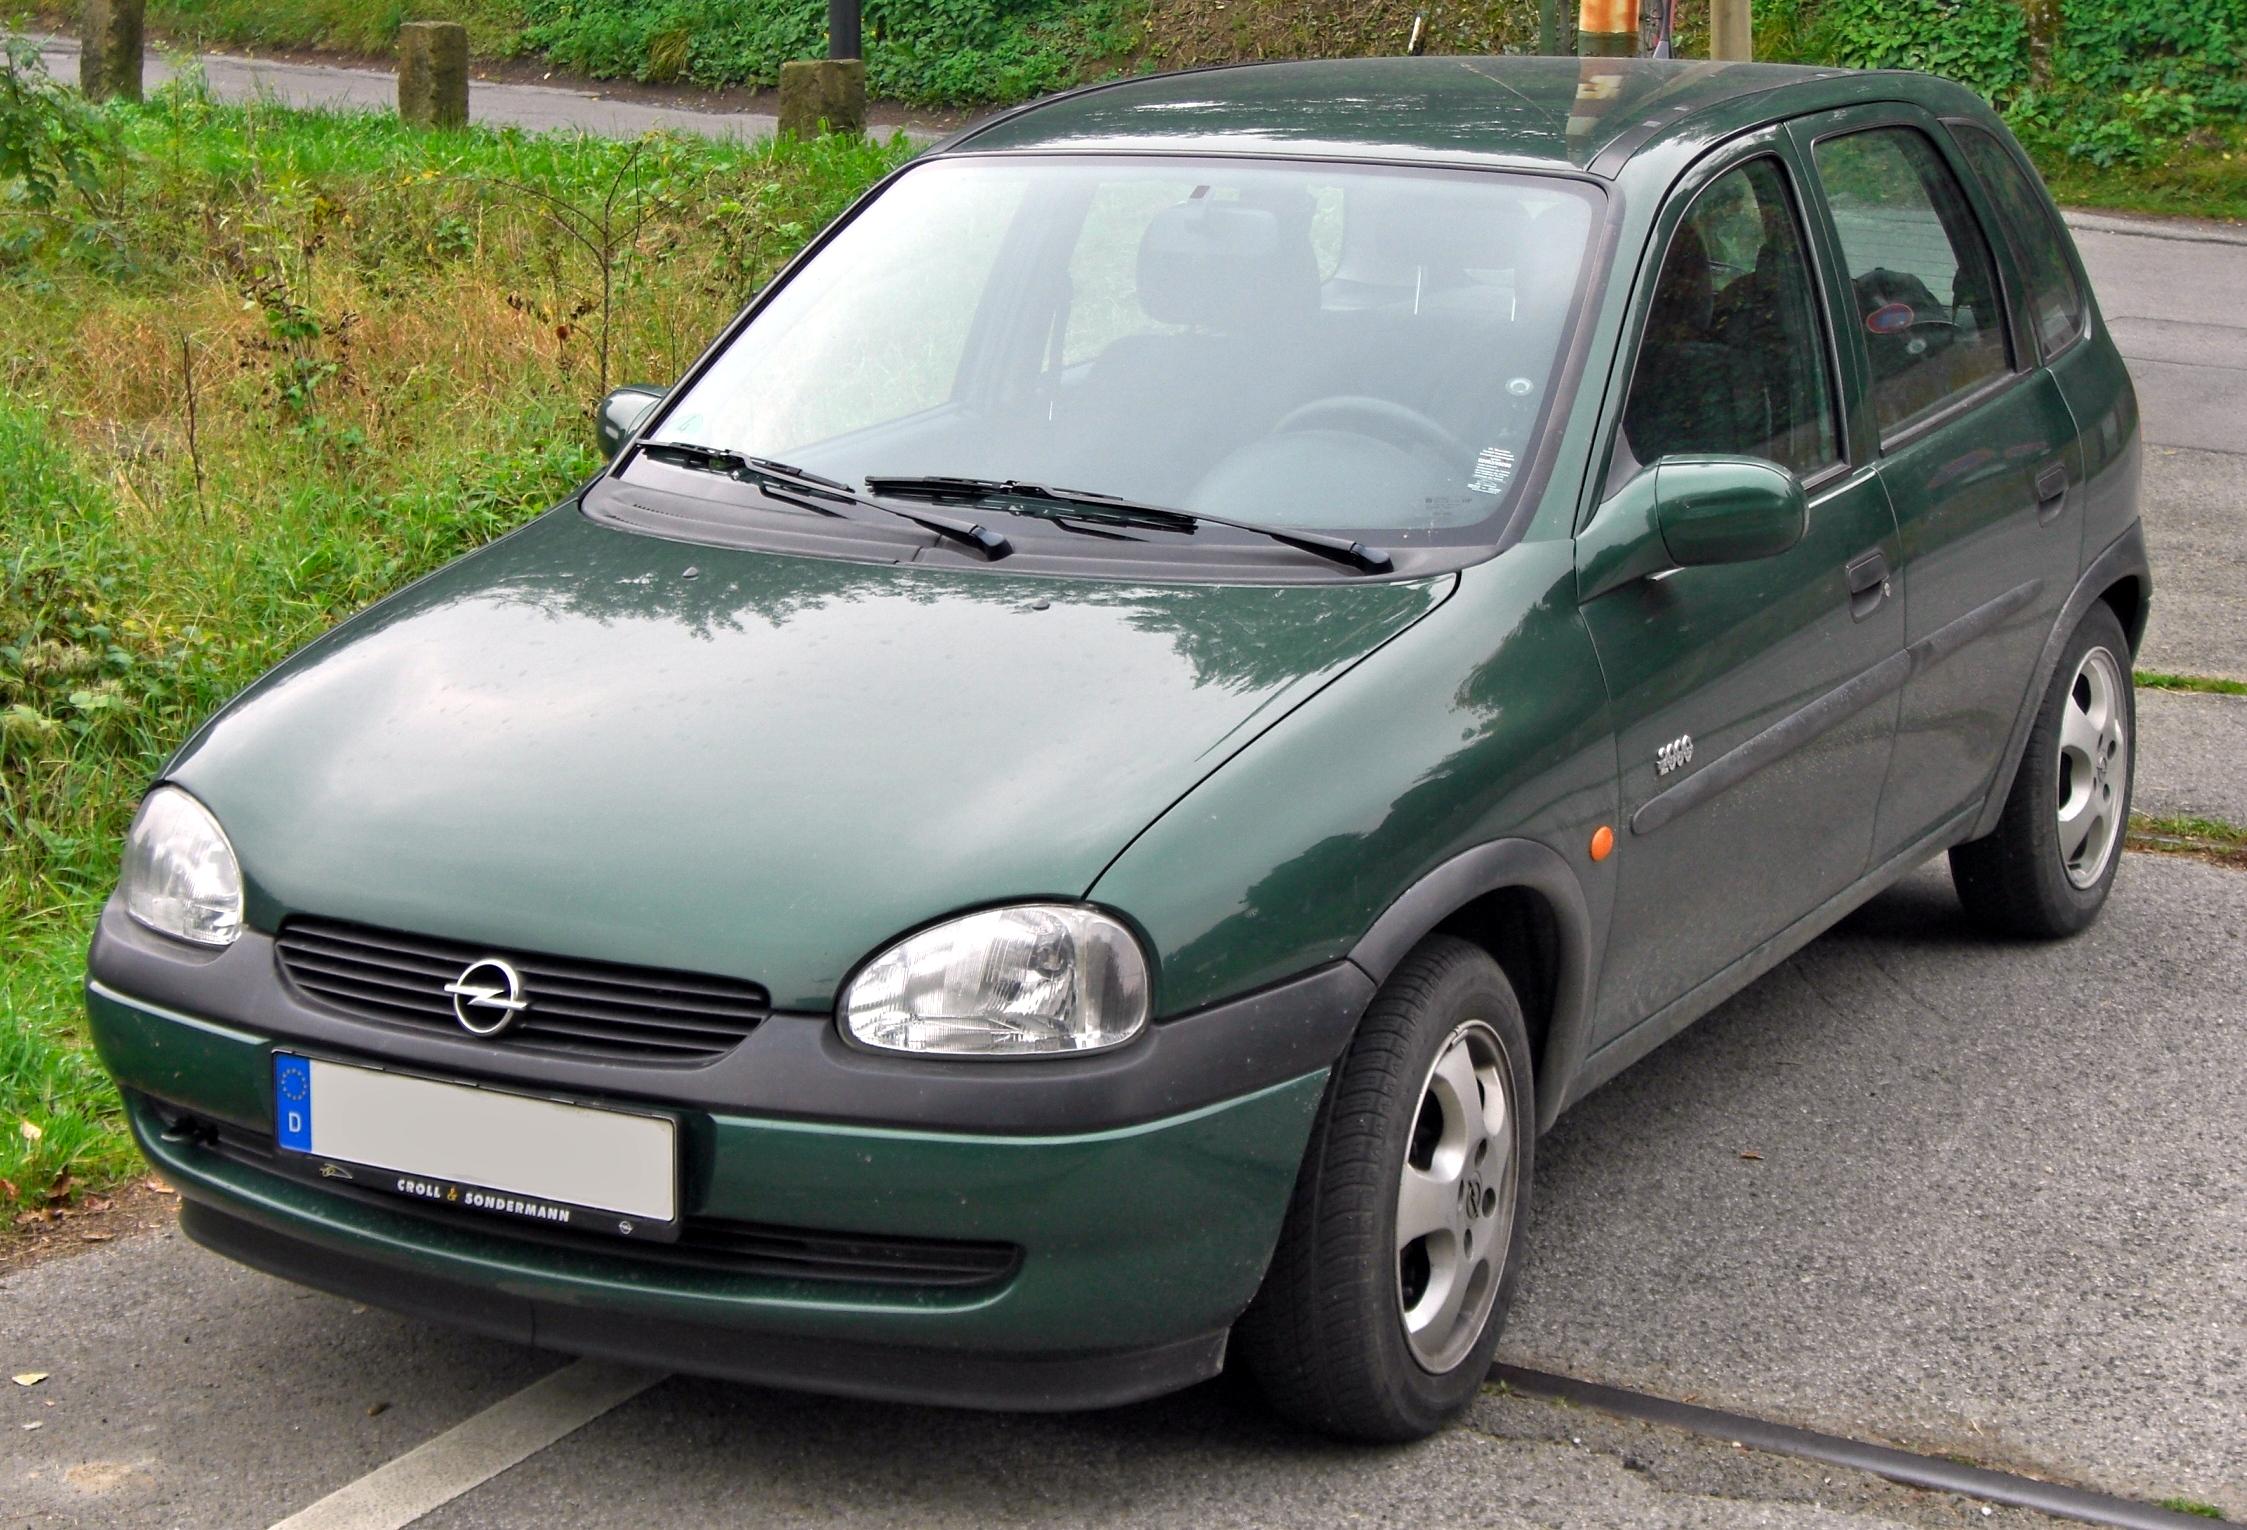 Pleasant File Opel Corsa B 1 2 16V Edition 2000 5 Turer Facelift Front Jpg Wiring Cloud Apomsimijknierdonabenoleattemohammedshrineorg